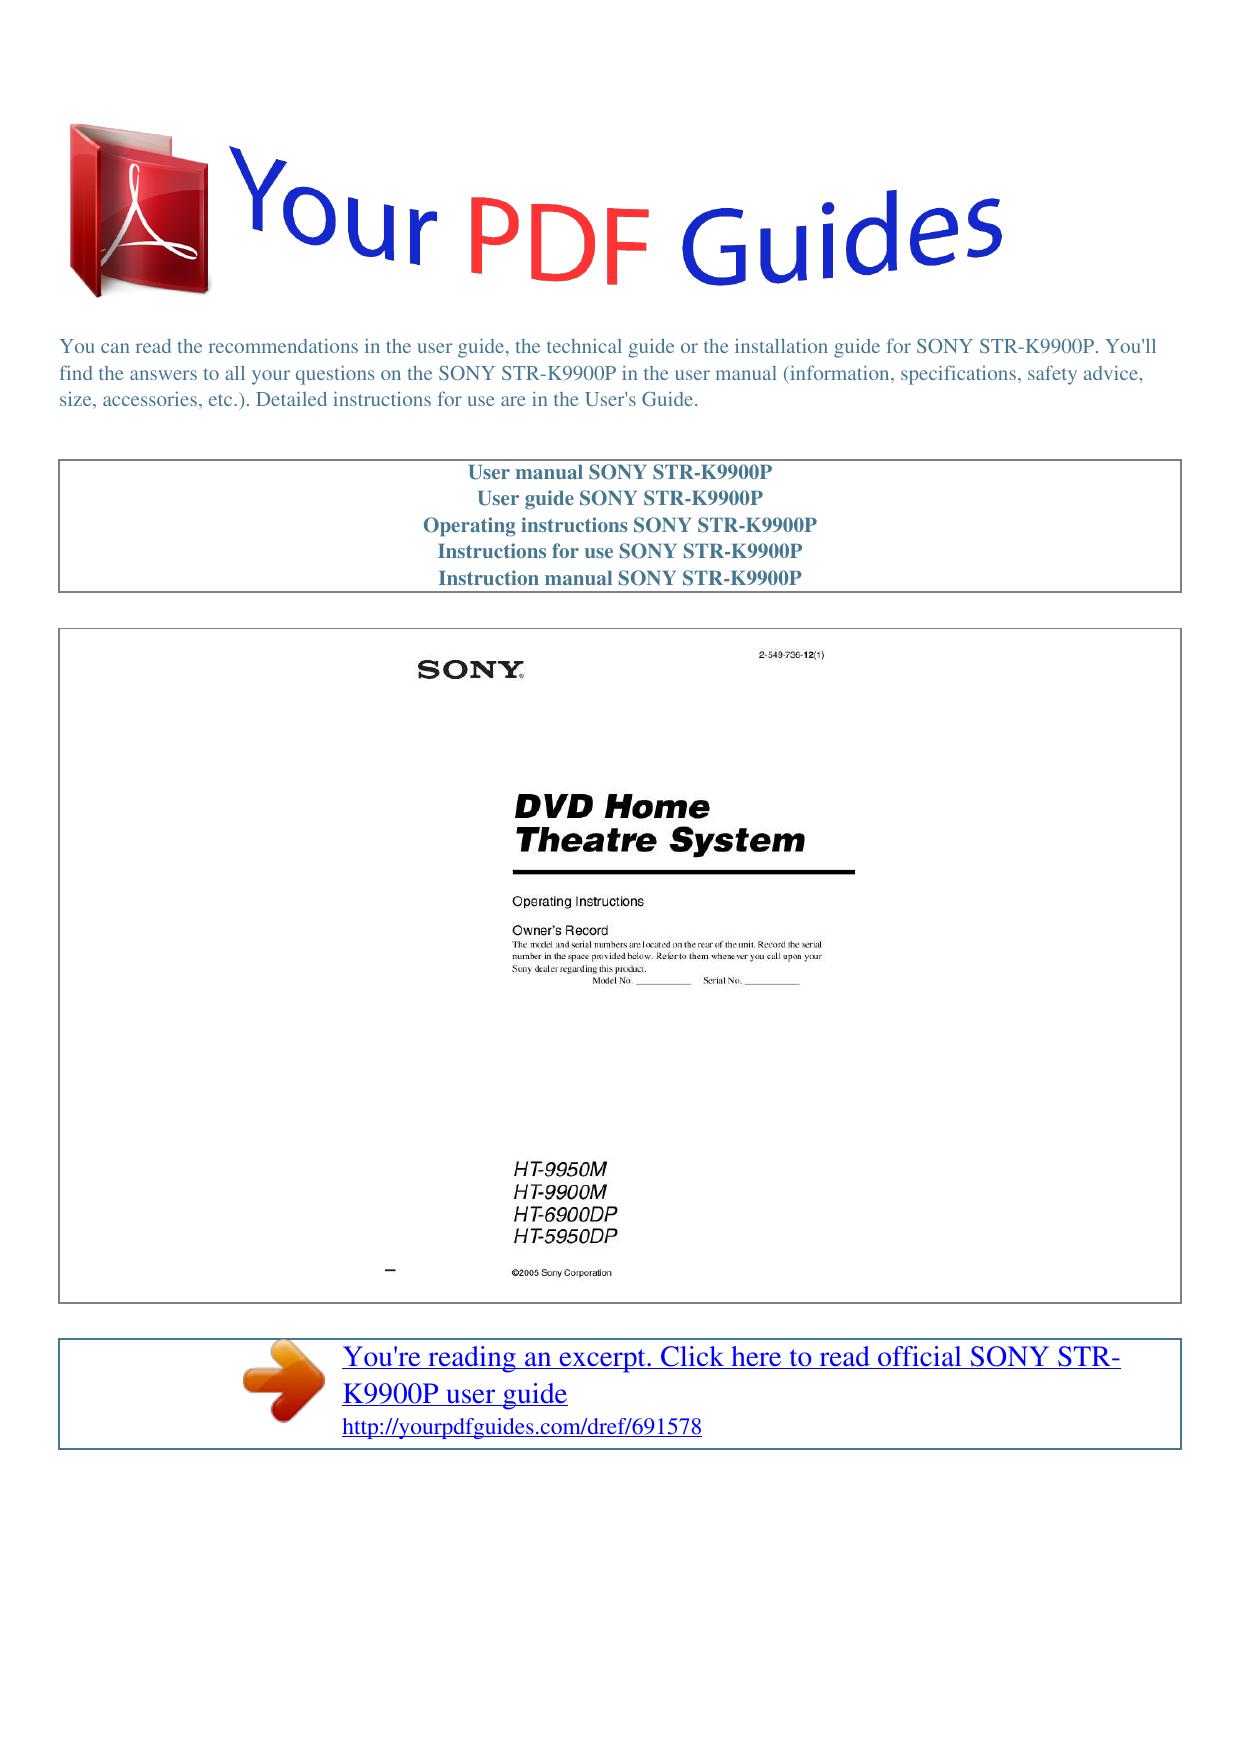 operating instructions sony str k9900p manualzz com rh manualzz com Instruction Manual Sony DAV HDX576WF Manual